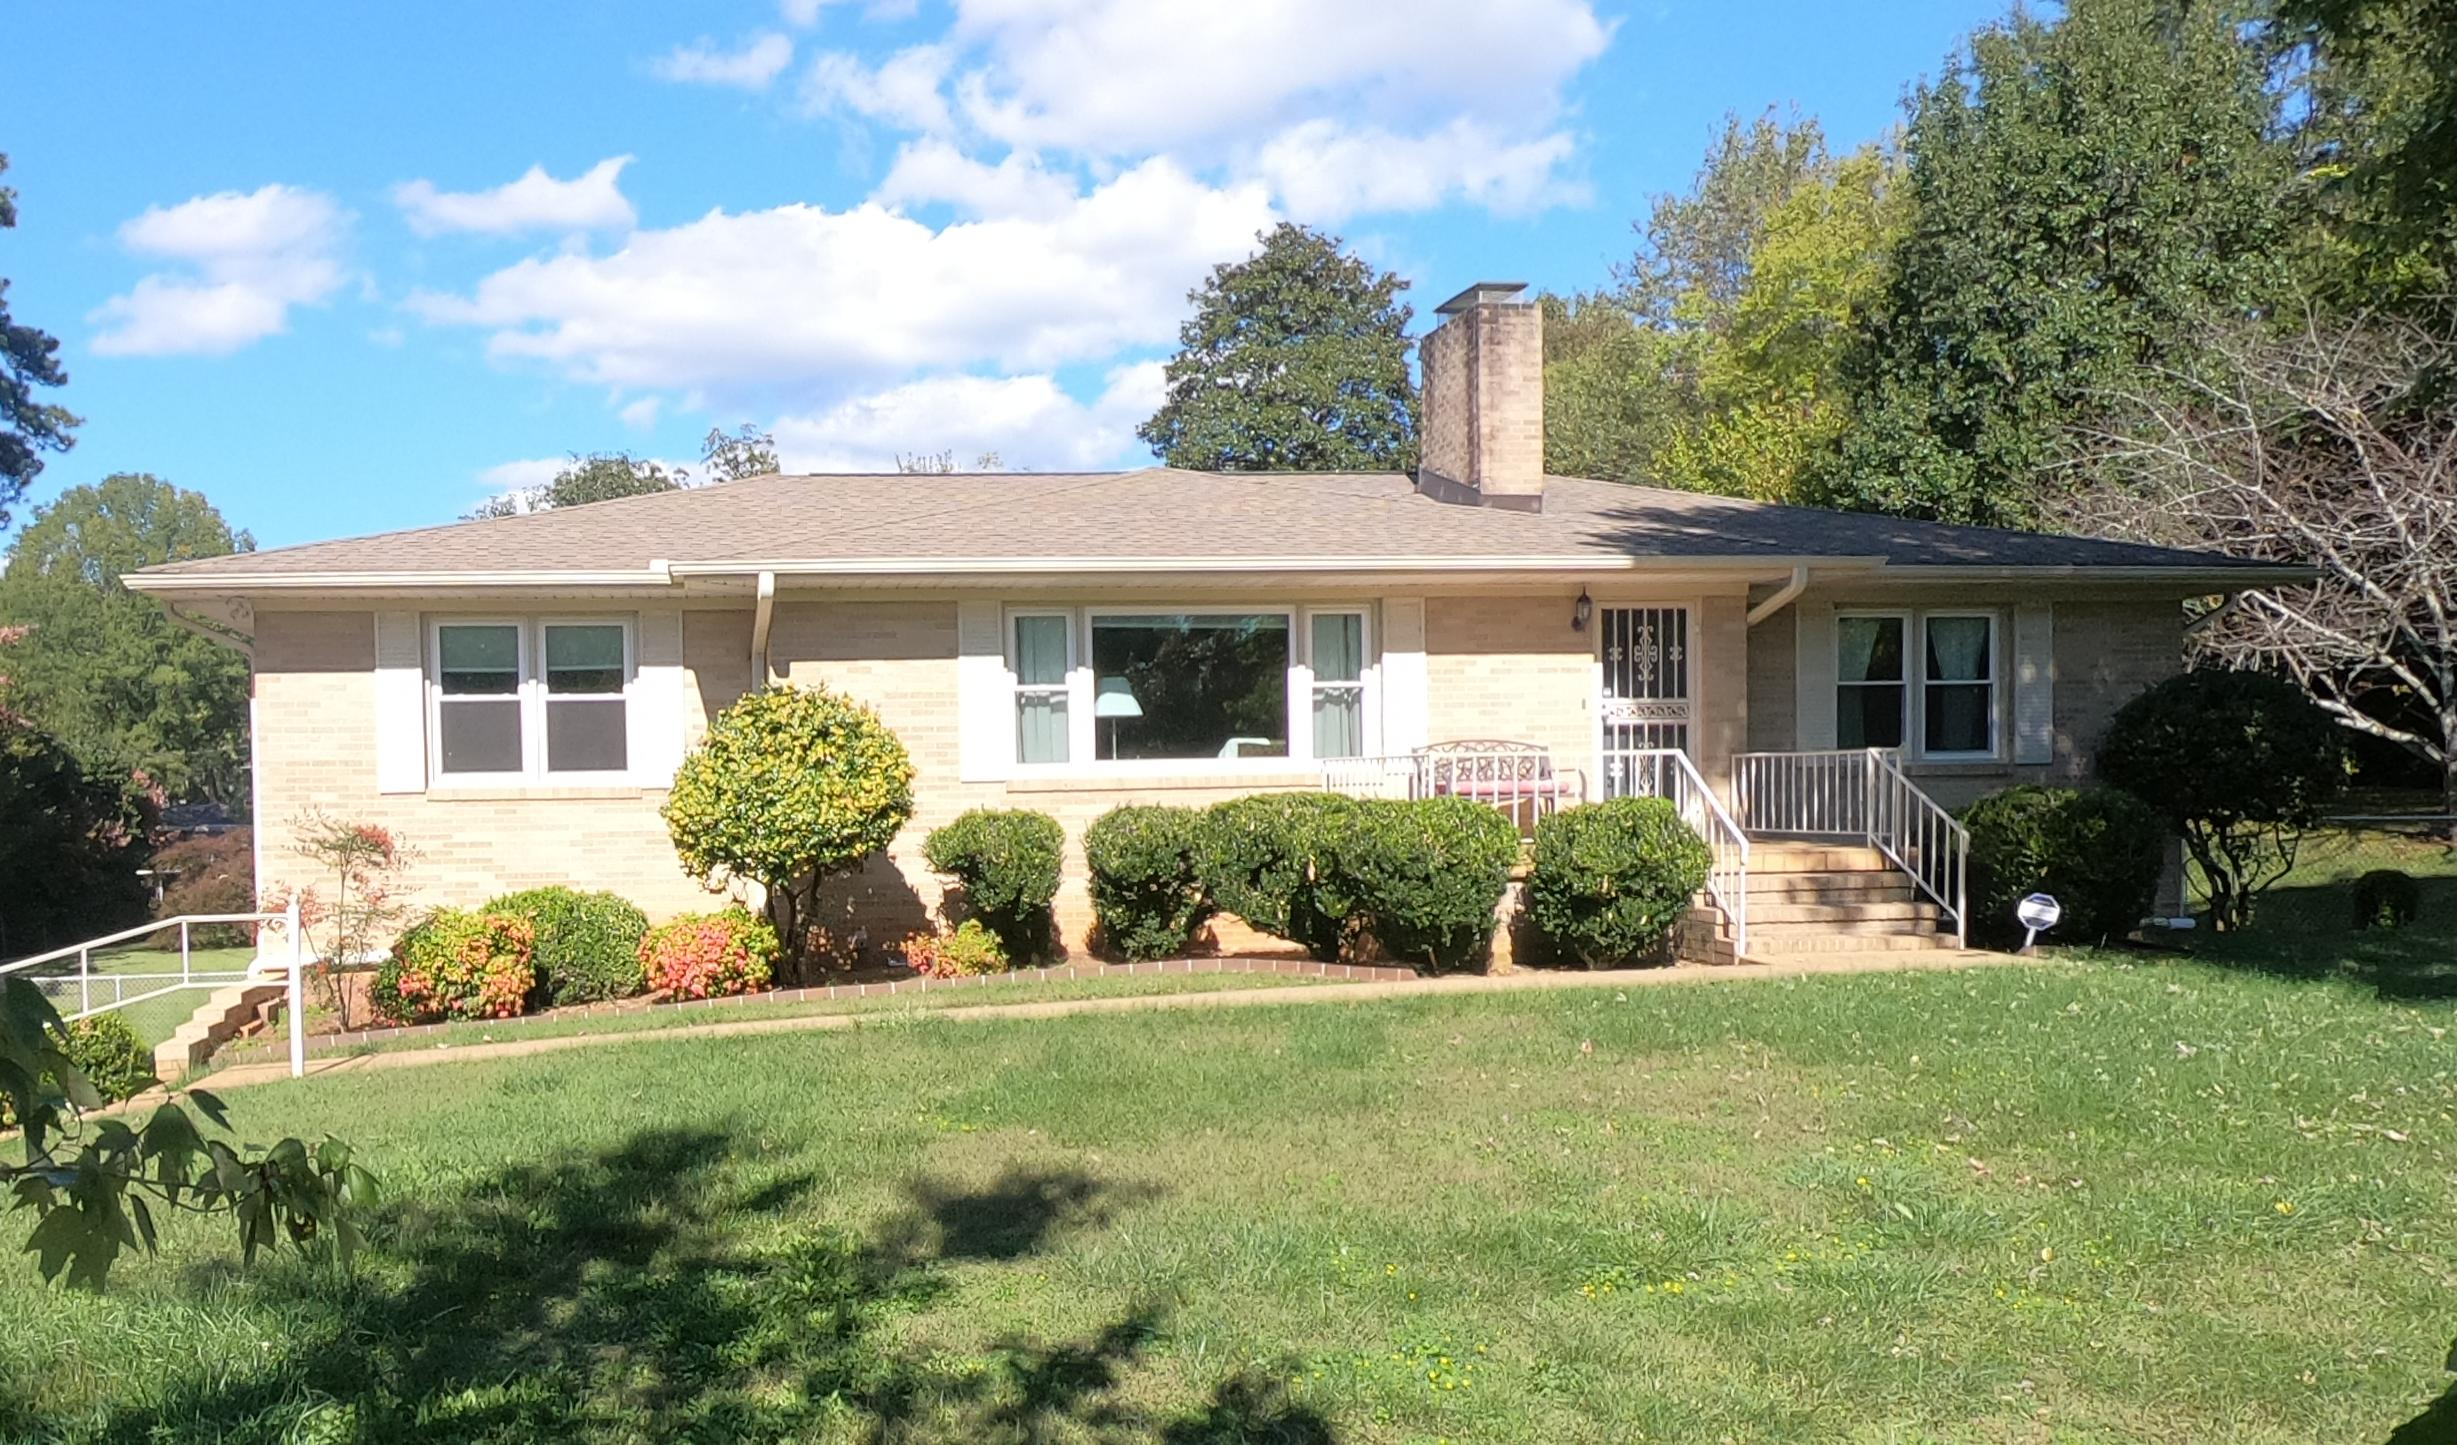 6855 Hickory Ln, Chattanooga, TN 37421